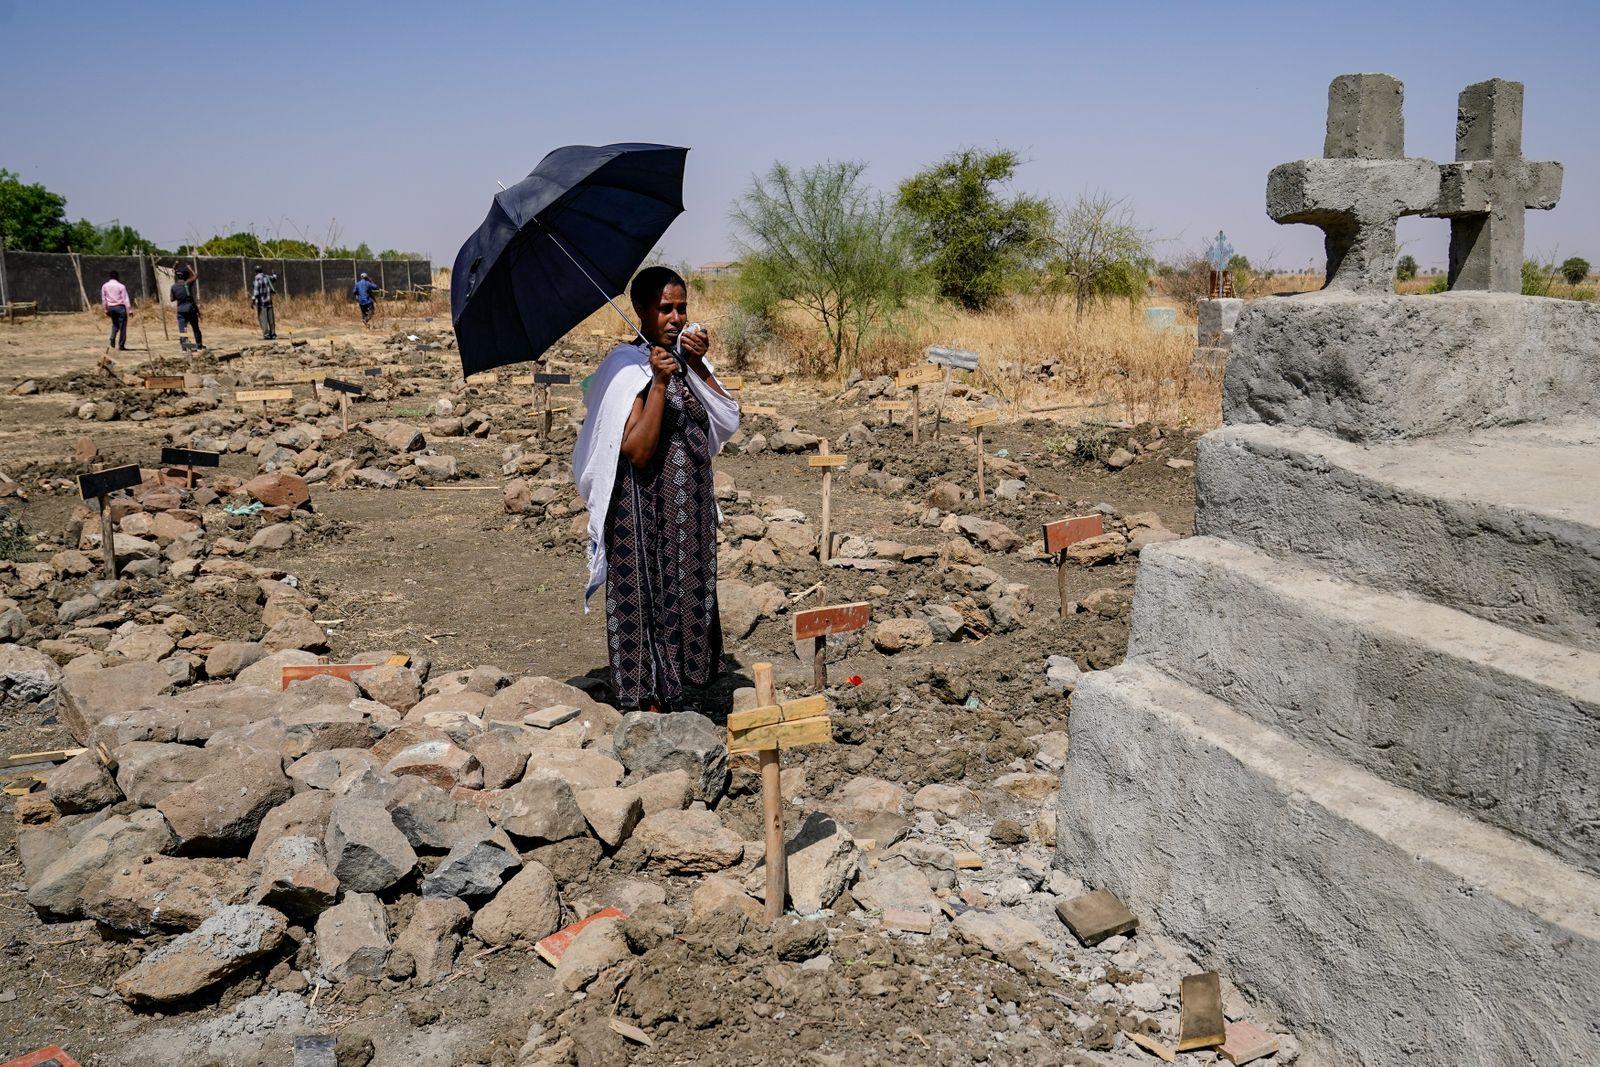 Mai Kadra Attack Survivors Allege Premeditated Ethnic Cleansing